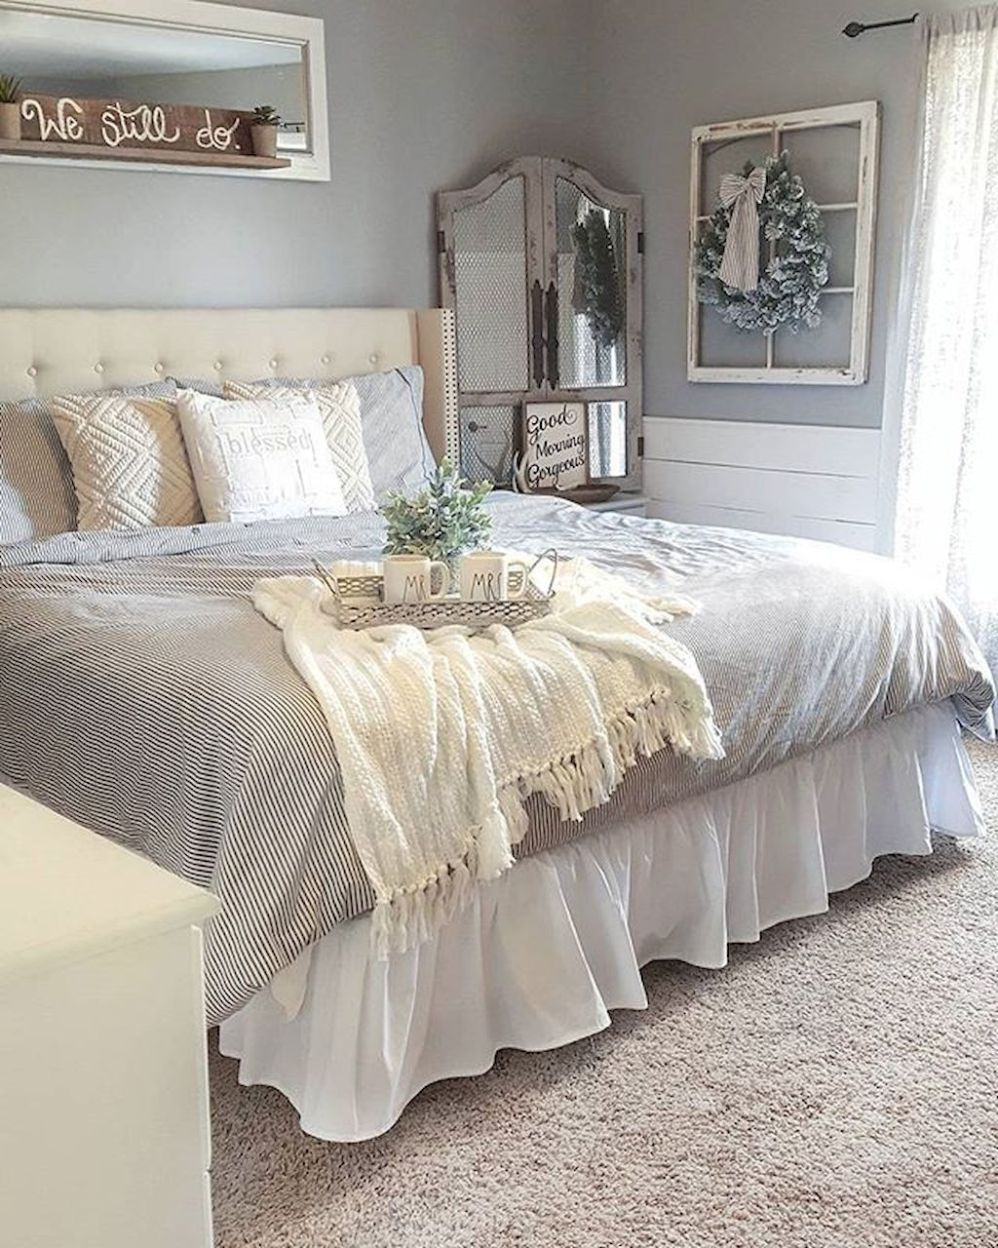 Romantic bedroom master bedroom bedroom decor ideas  Pin by Amber Wagaman on Master bedroom  Pinterest  Bedrooms